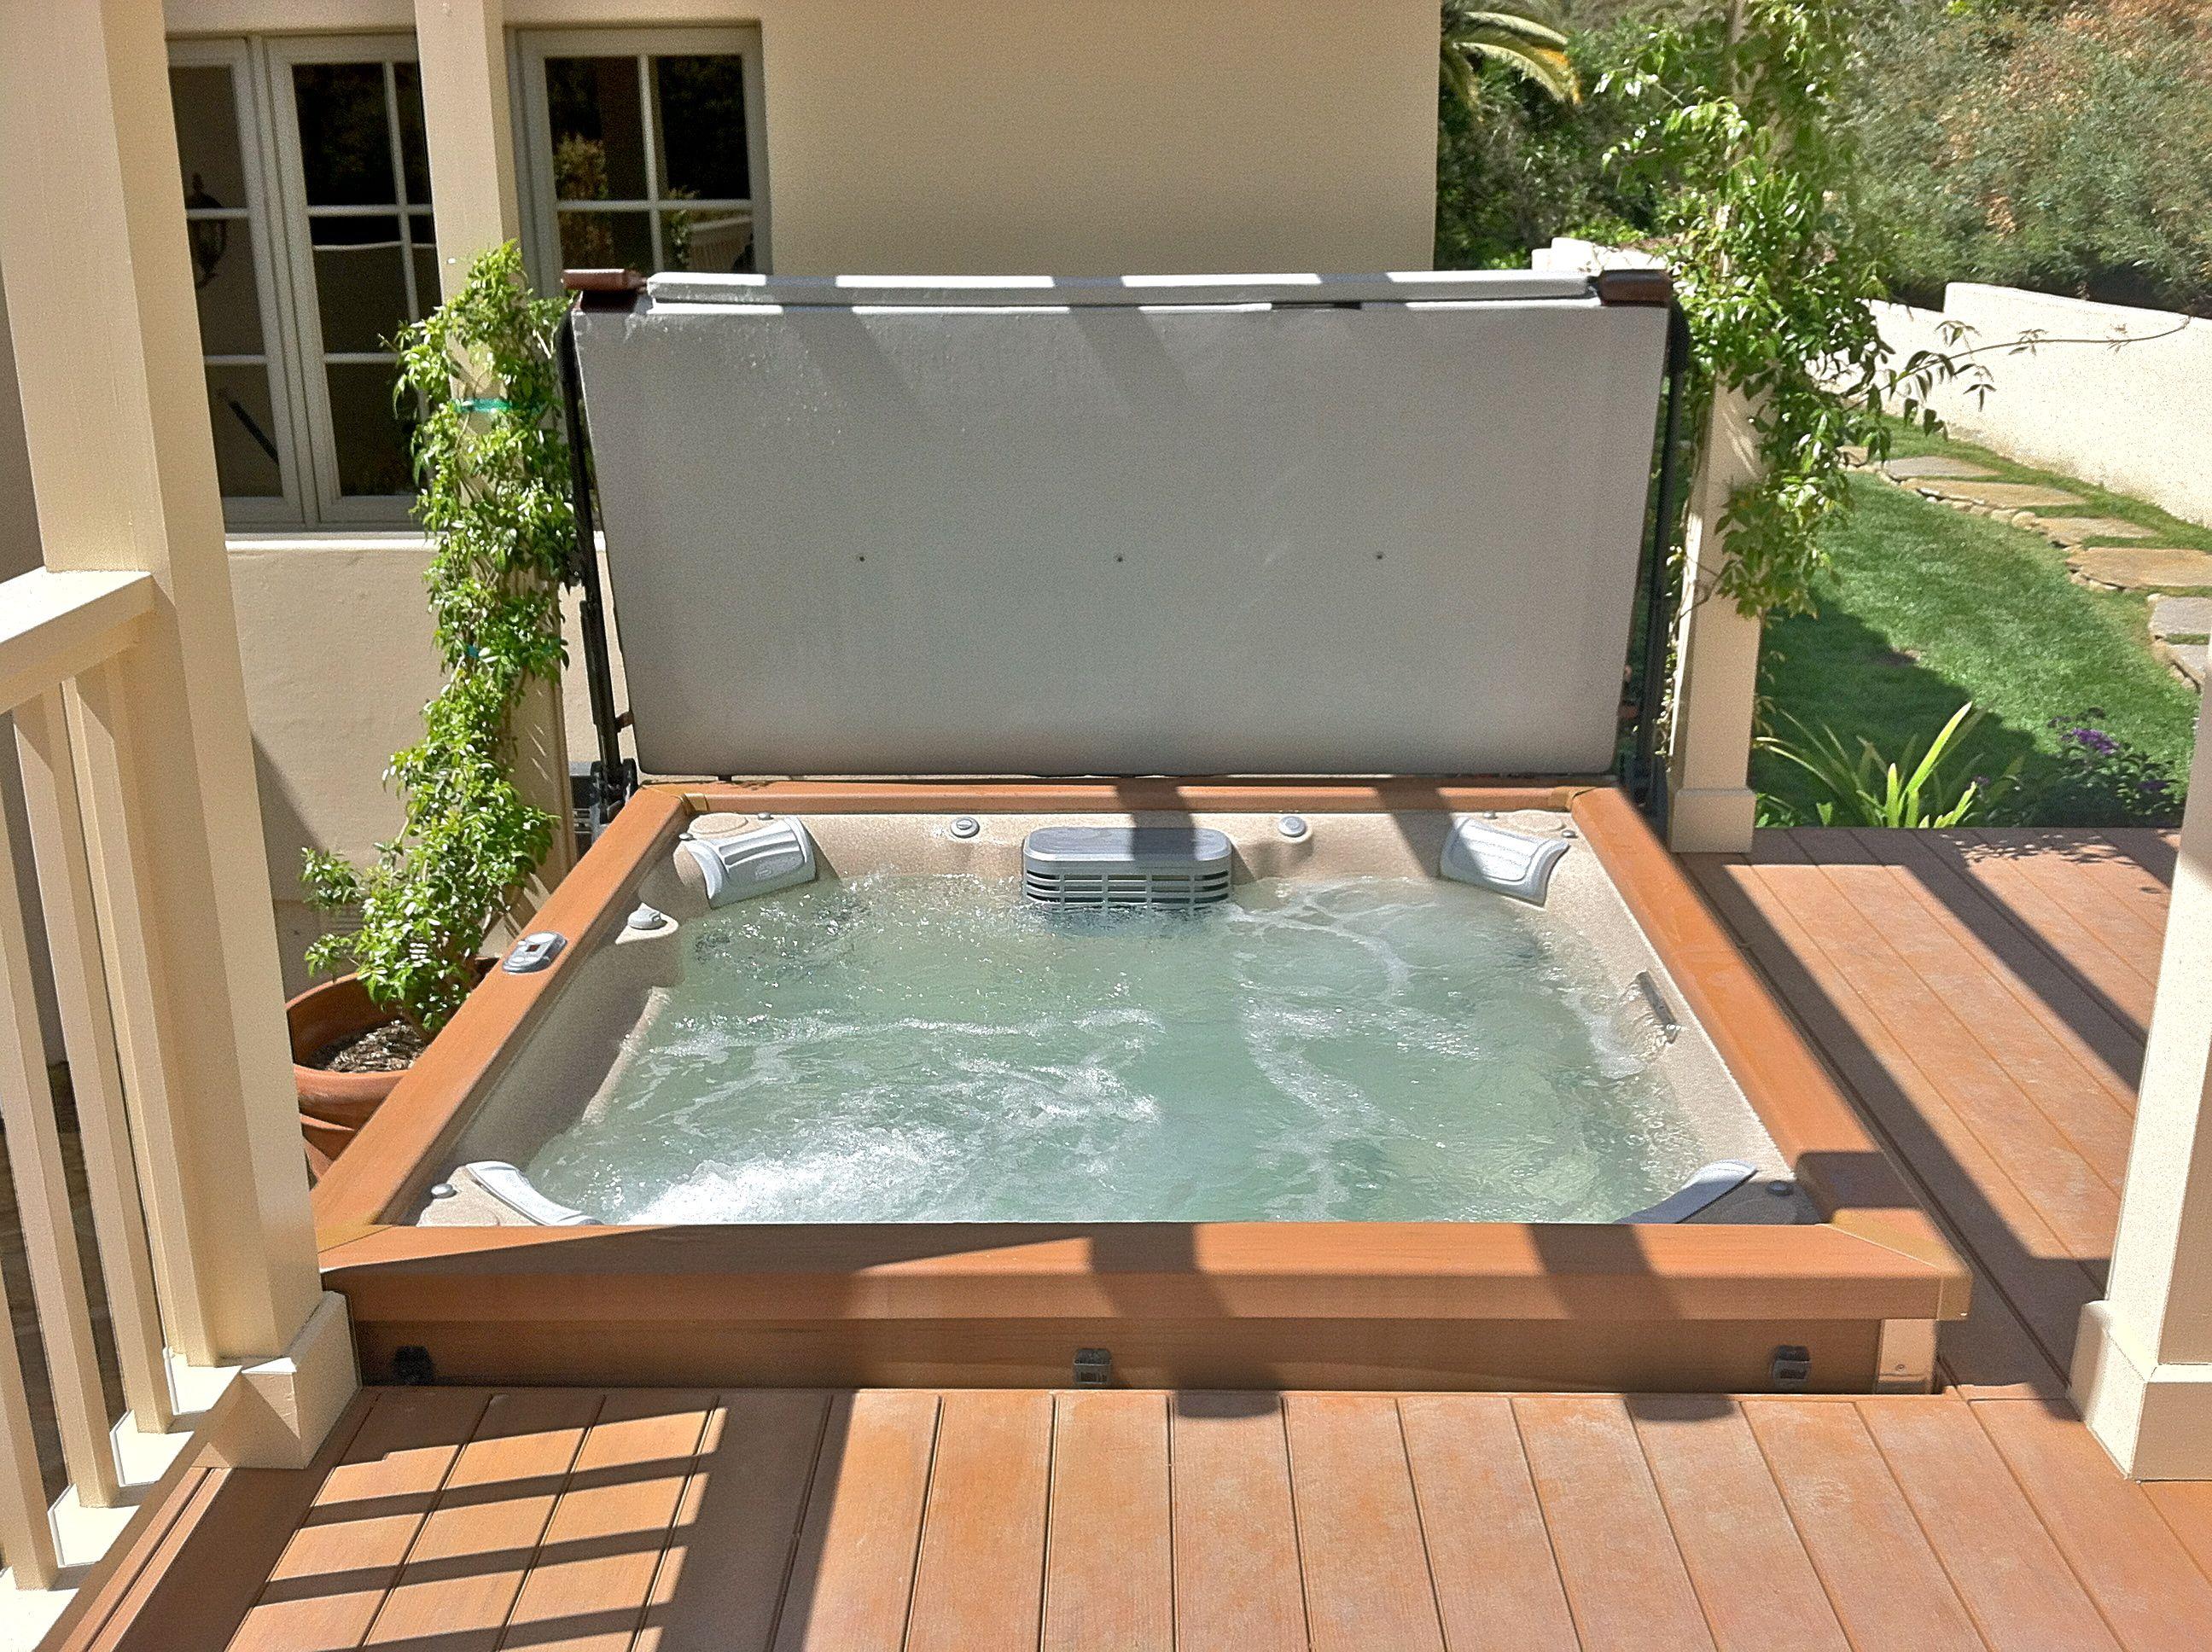 modern looking jacuzzi jlx spa set in deck www gordonandgrant com